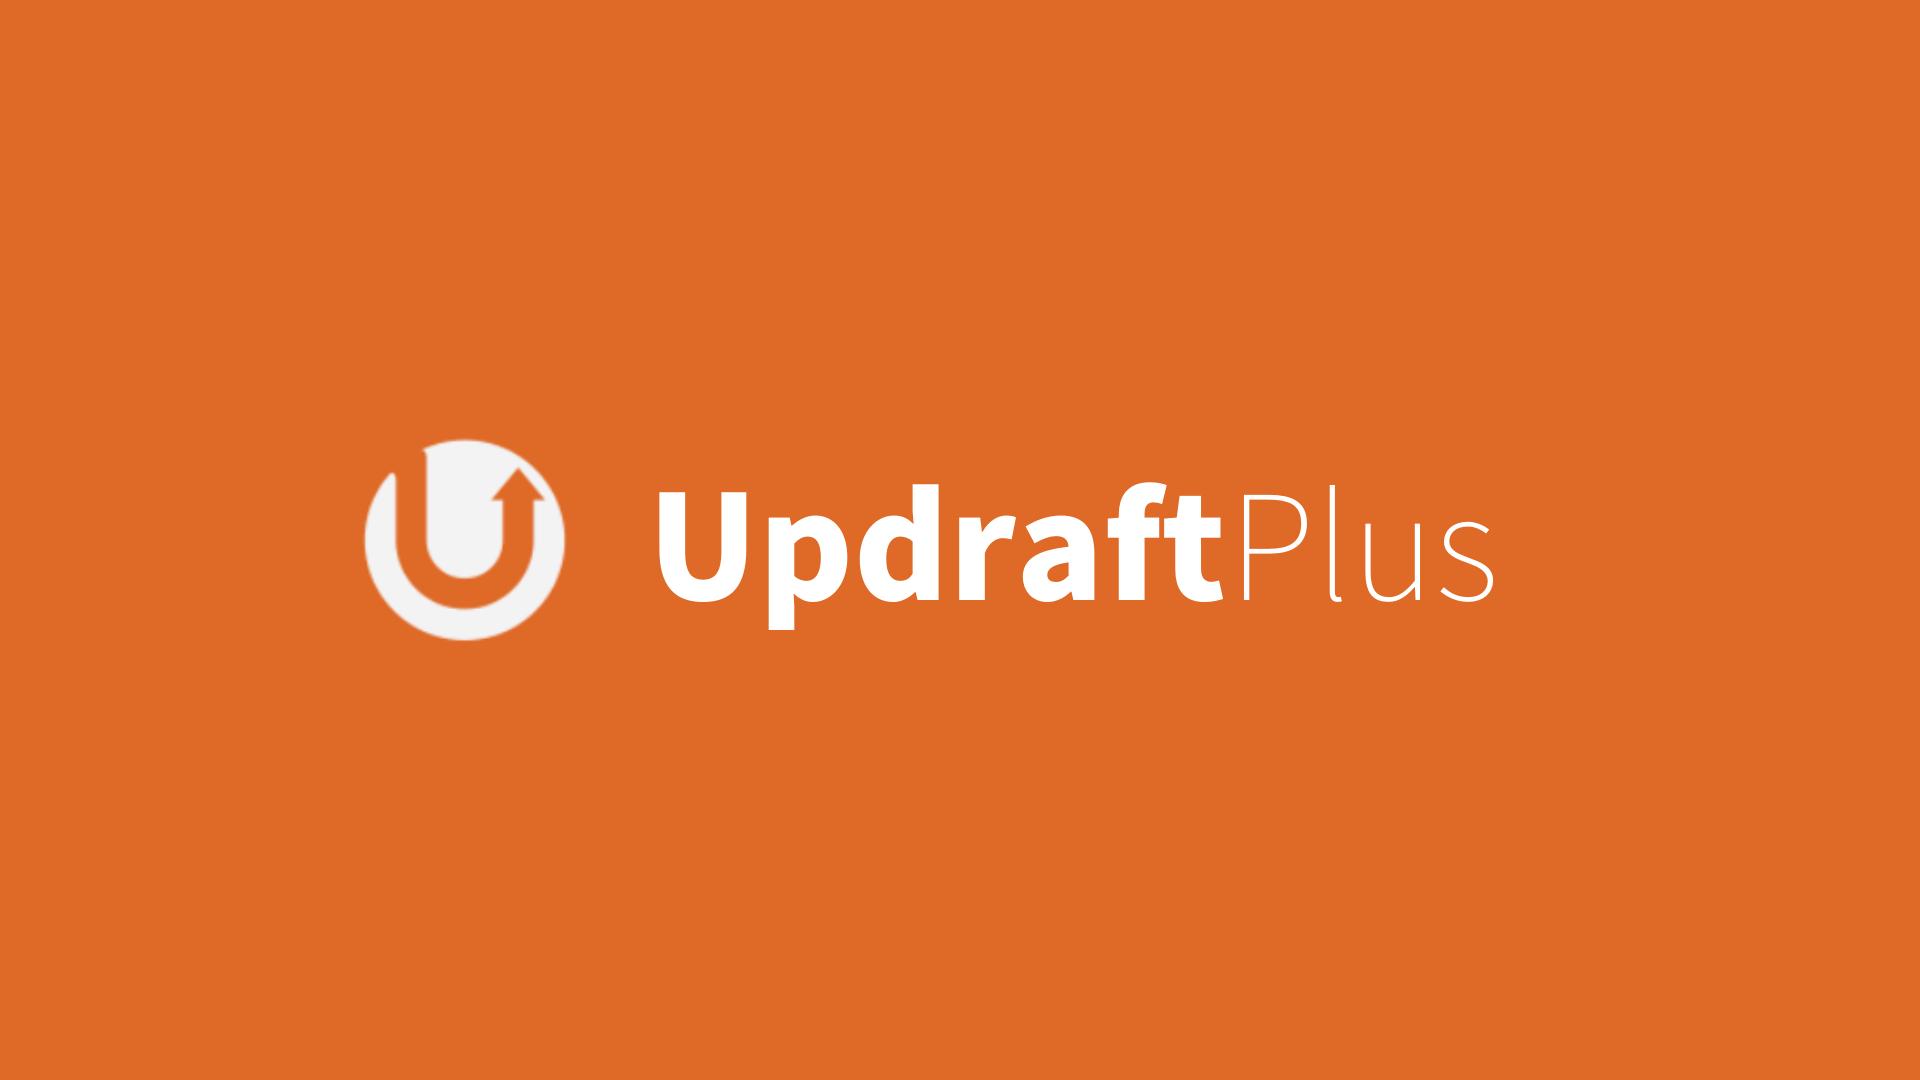 WordPressバックアッププラグインはUpdraftPlus一択!【復元まで簡単】